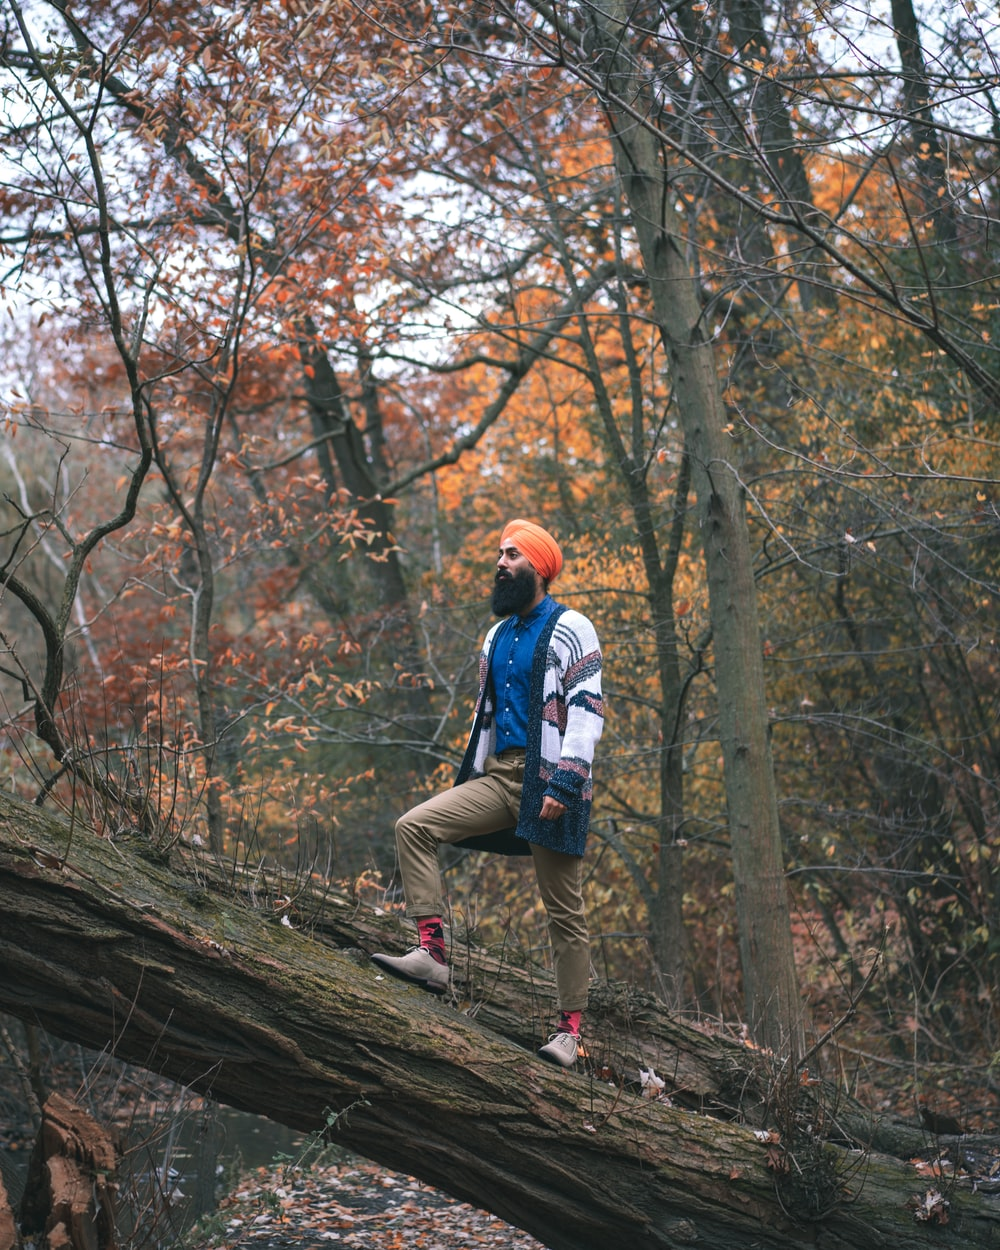 man in blue jacket and brown pants wearing blue backpack walking on brown tree log during